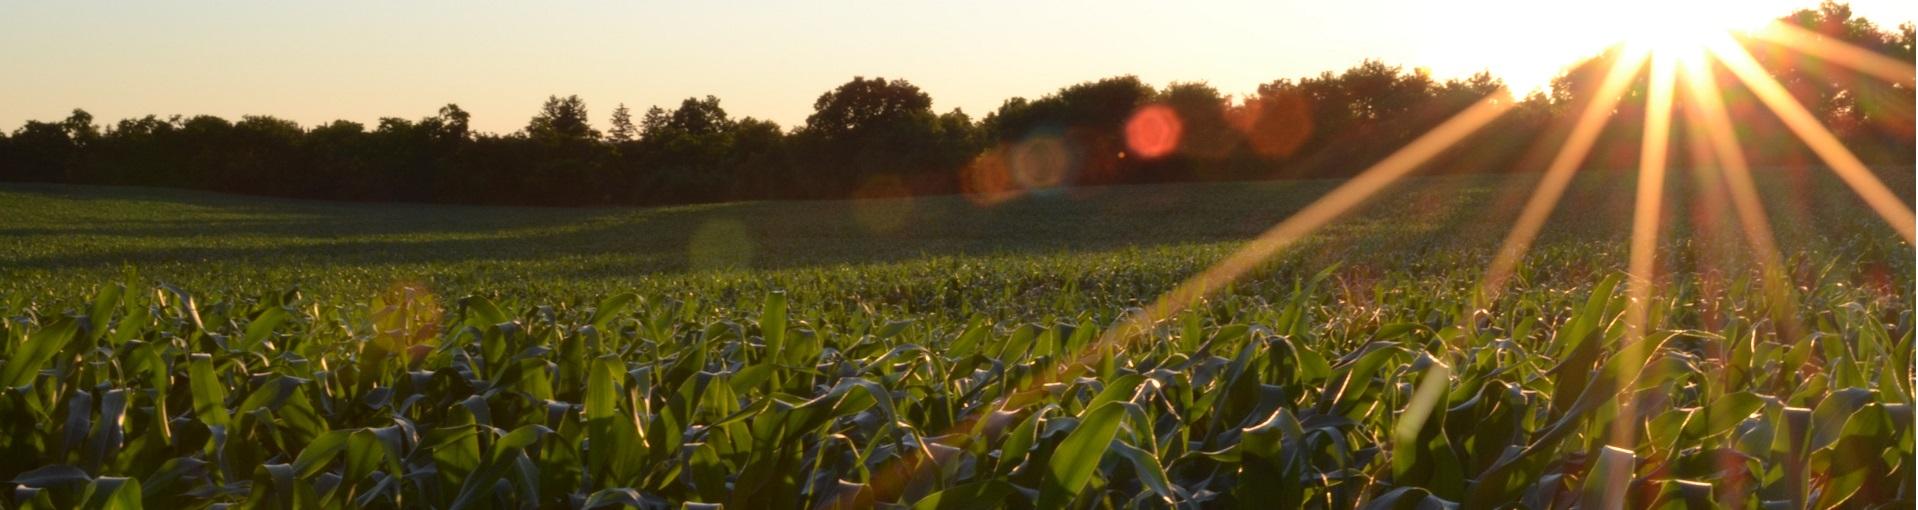 Farm land